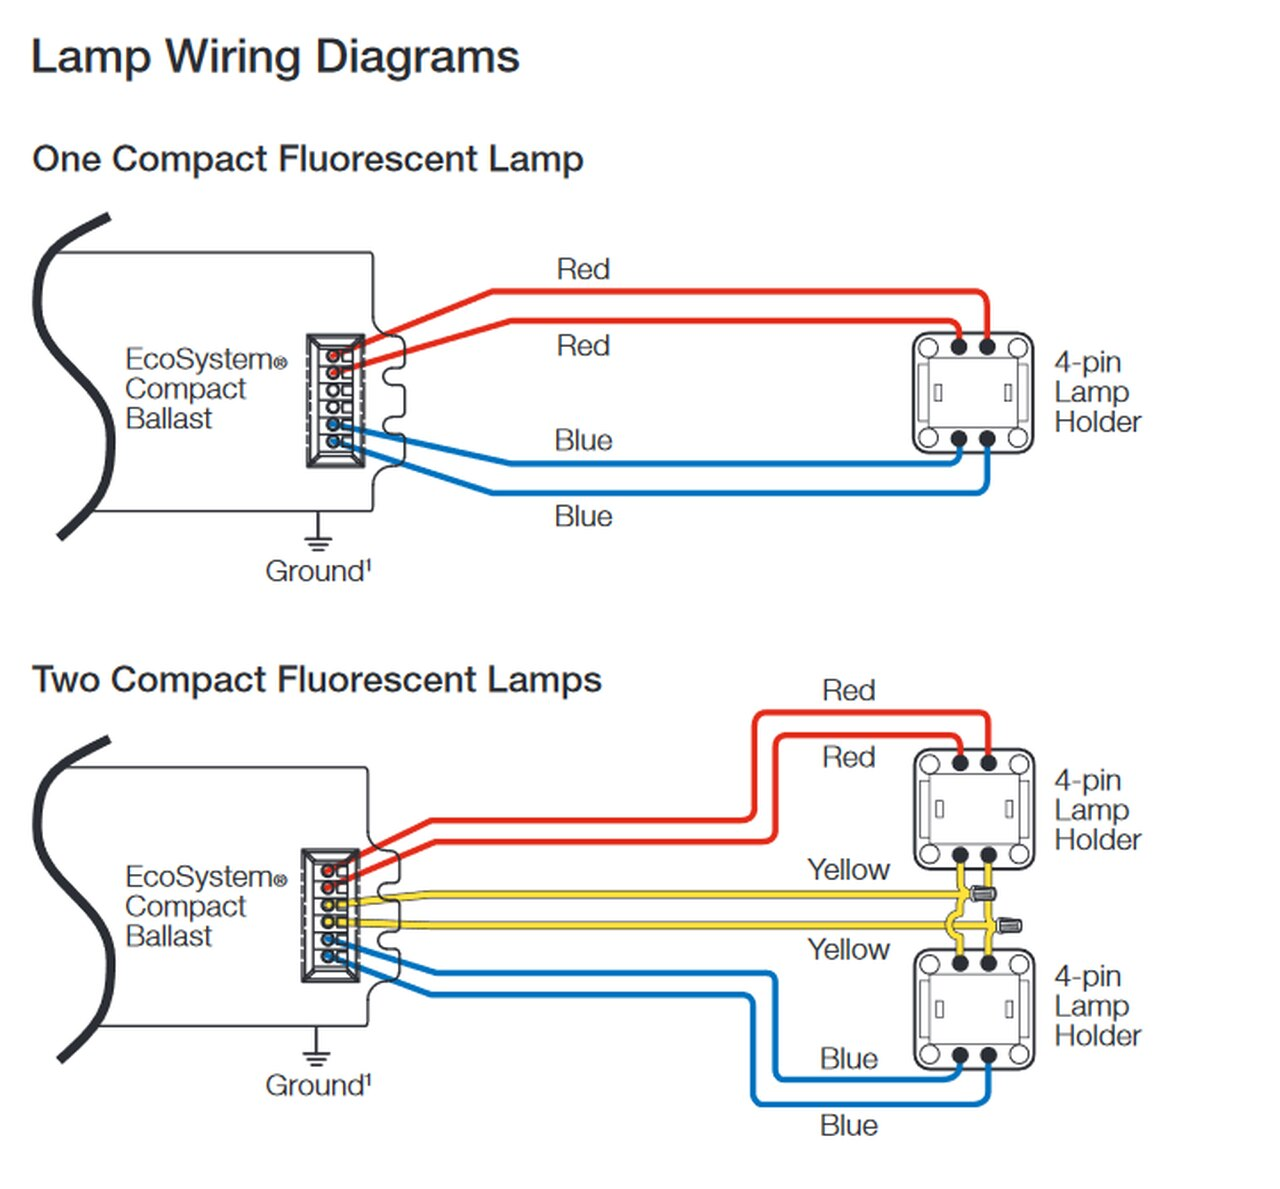 zf_5118] 4 pin compact fluorescent wiring diagram schematic wiring  hete ical gram botse itis viewor mohammedshrine librar wiring 101